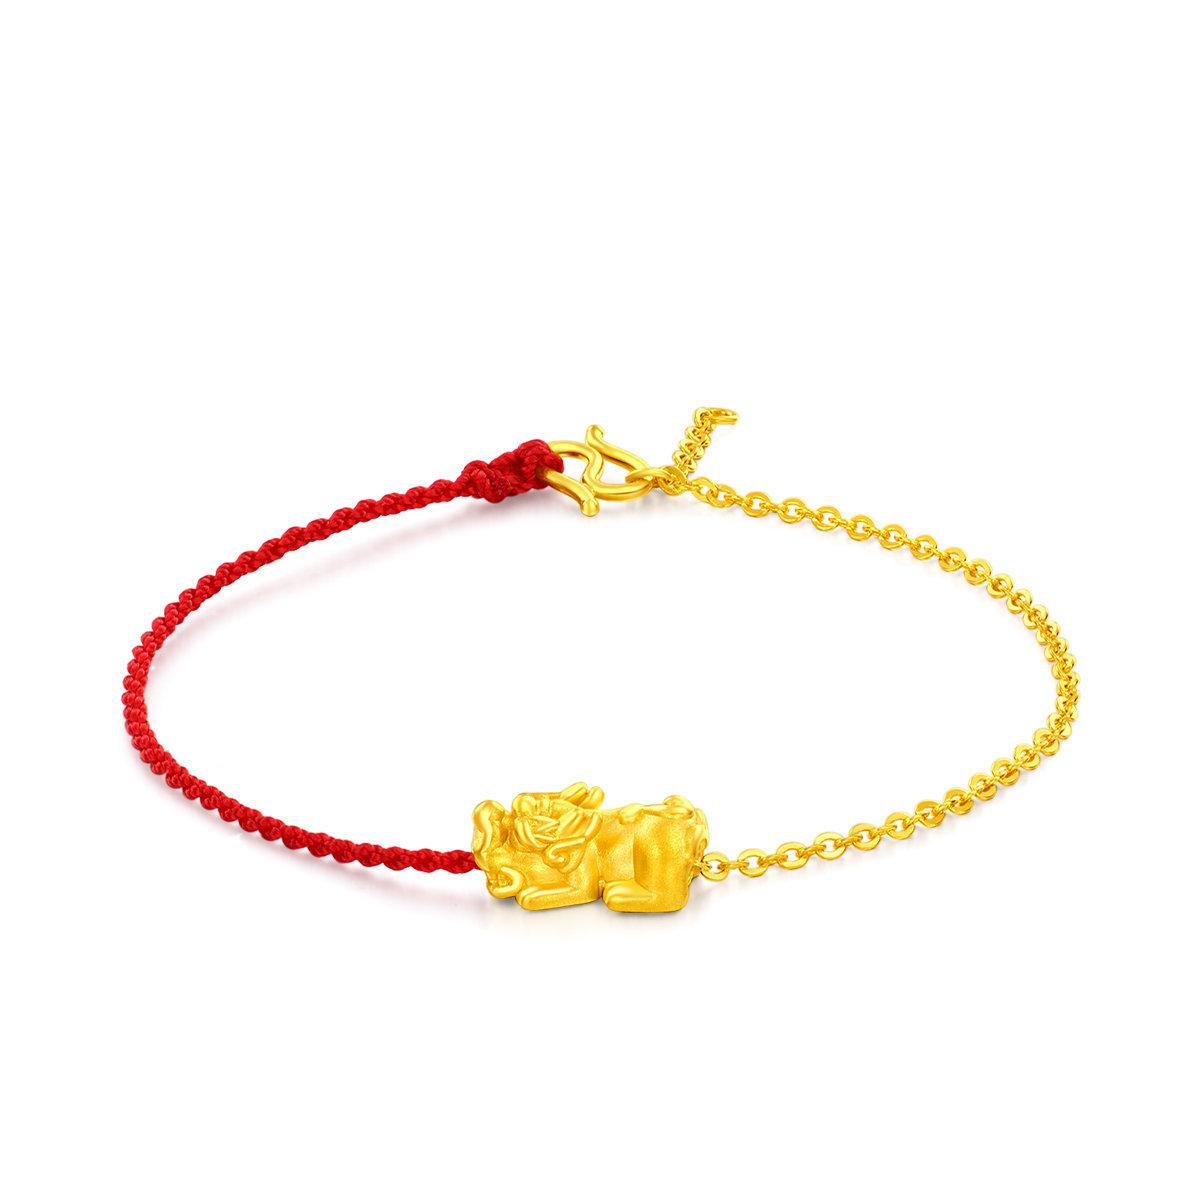 999 Gold Pixiu Bracelet